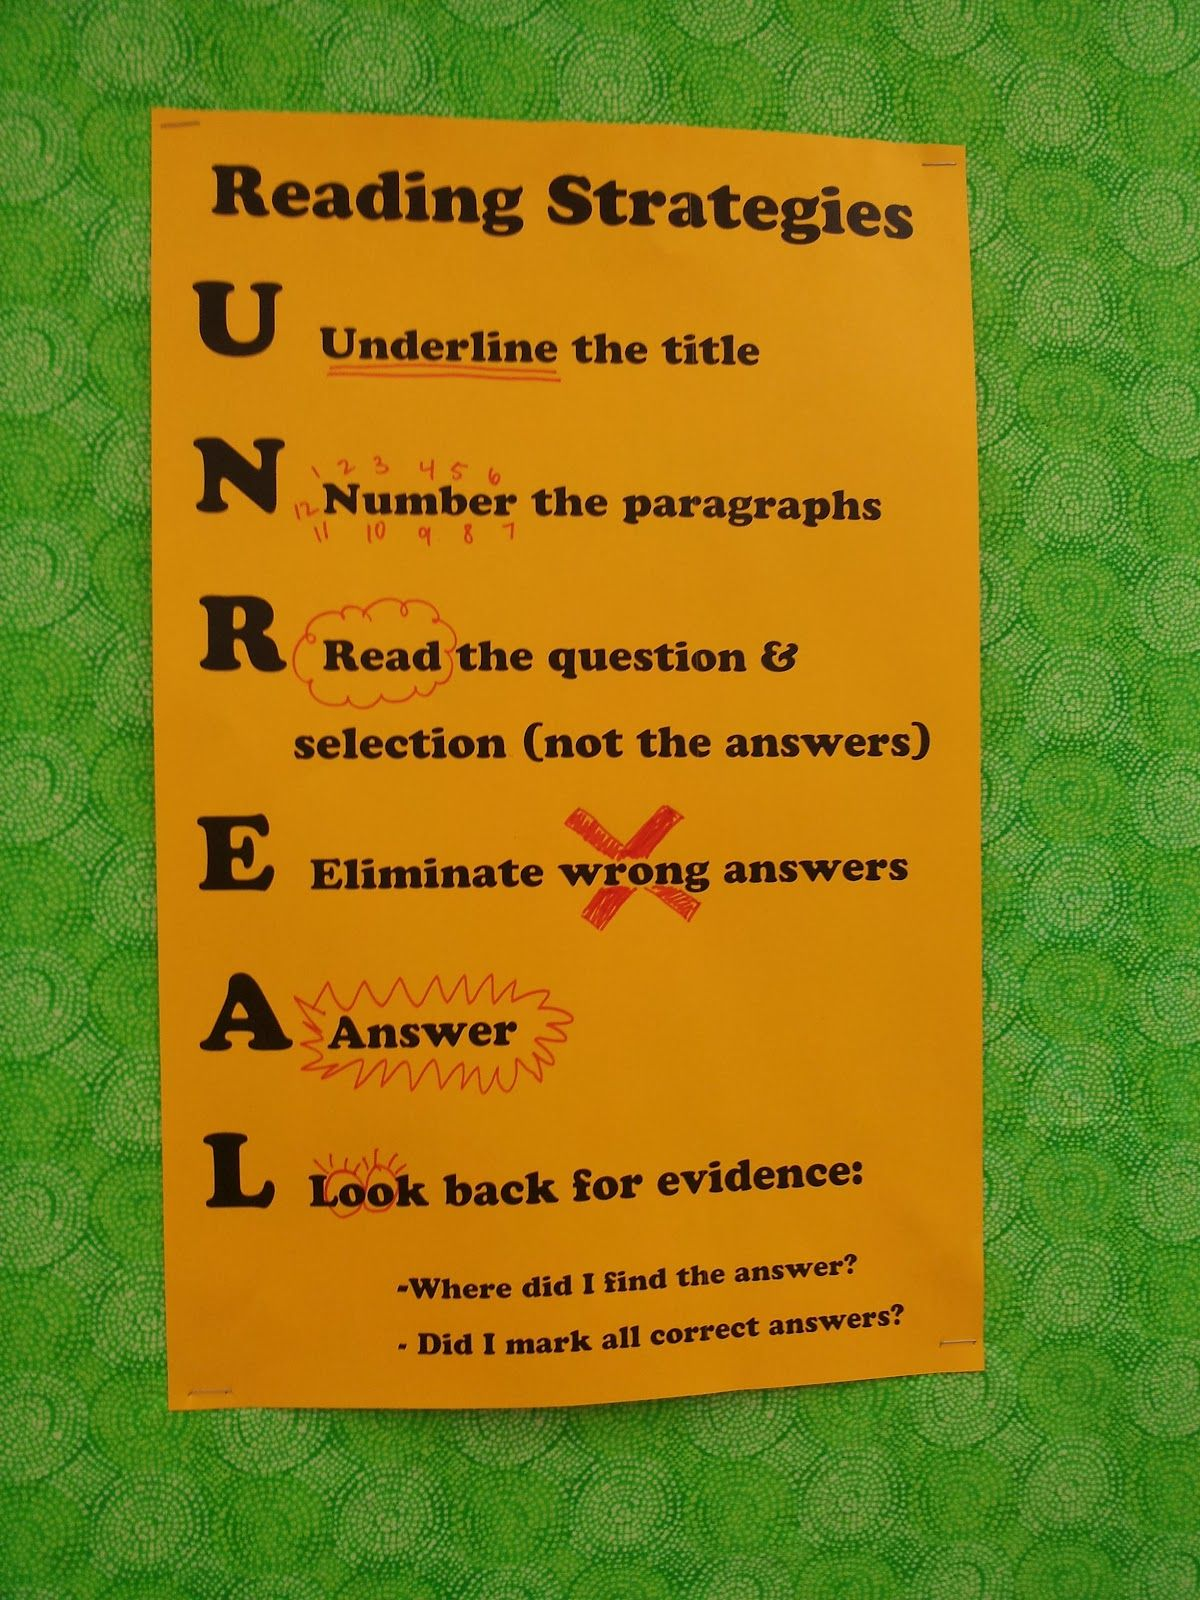 Unreal Reading Strategies Anchor Chart For Esl Ells Emerald City Classroom Set Up Reading Strategies Anchor Charts Reading Strategies Reading Classroom Reading strategies for esl students